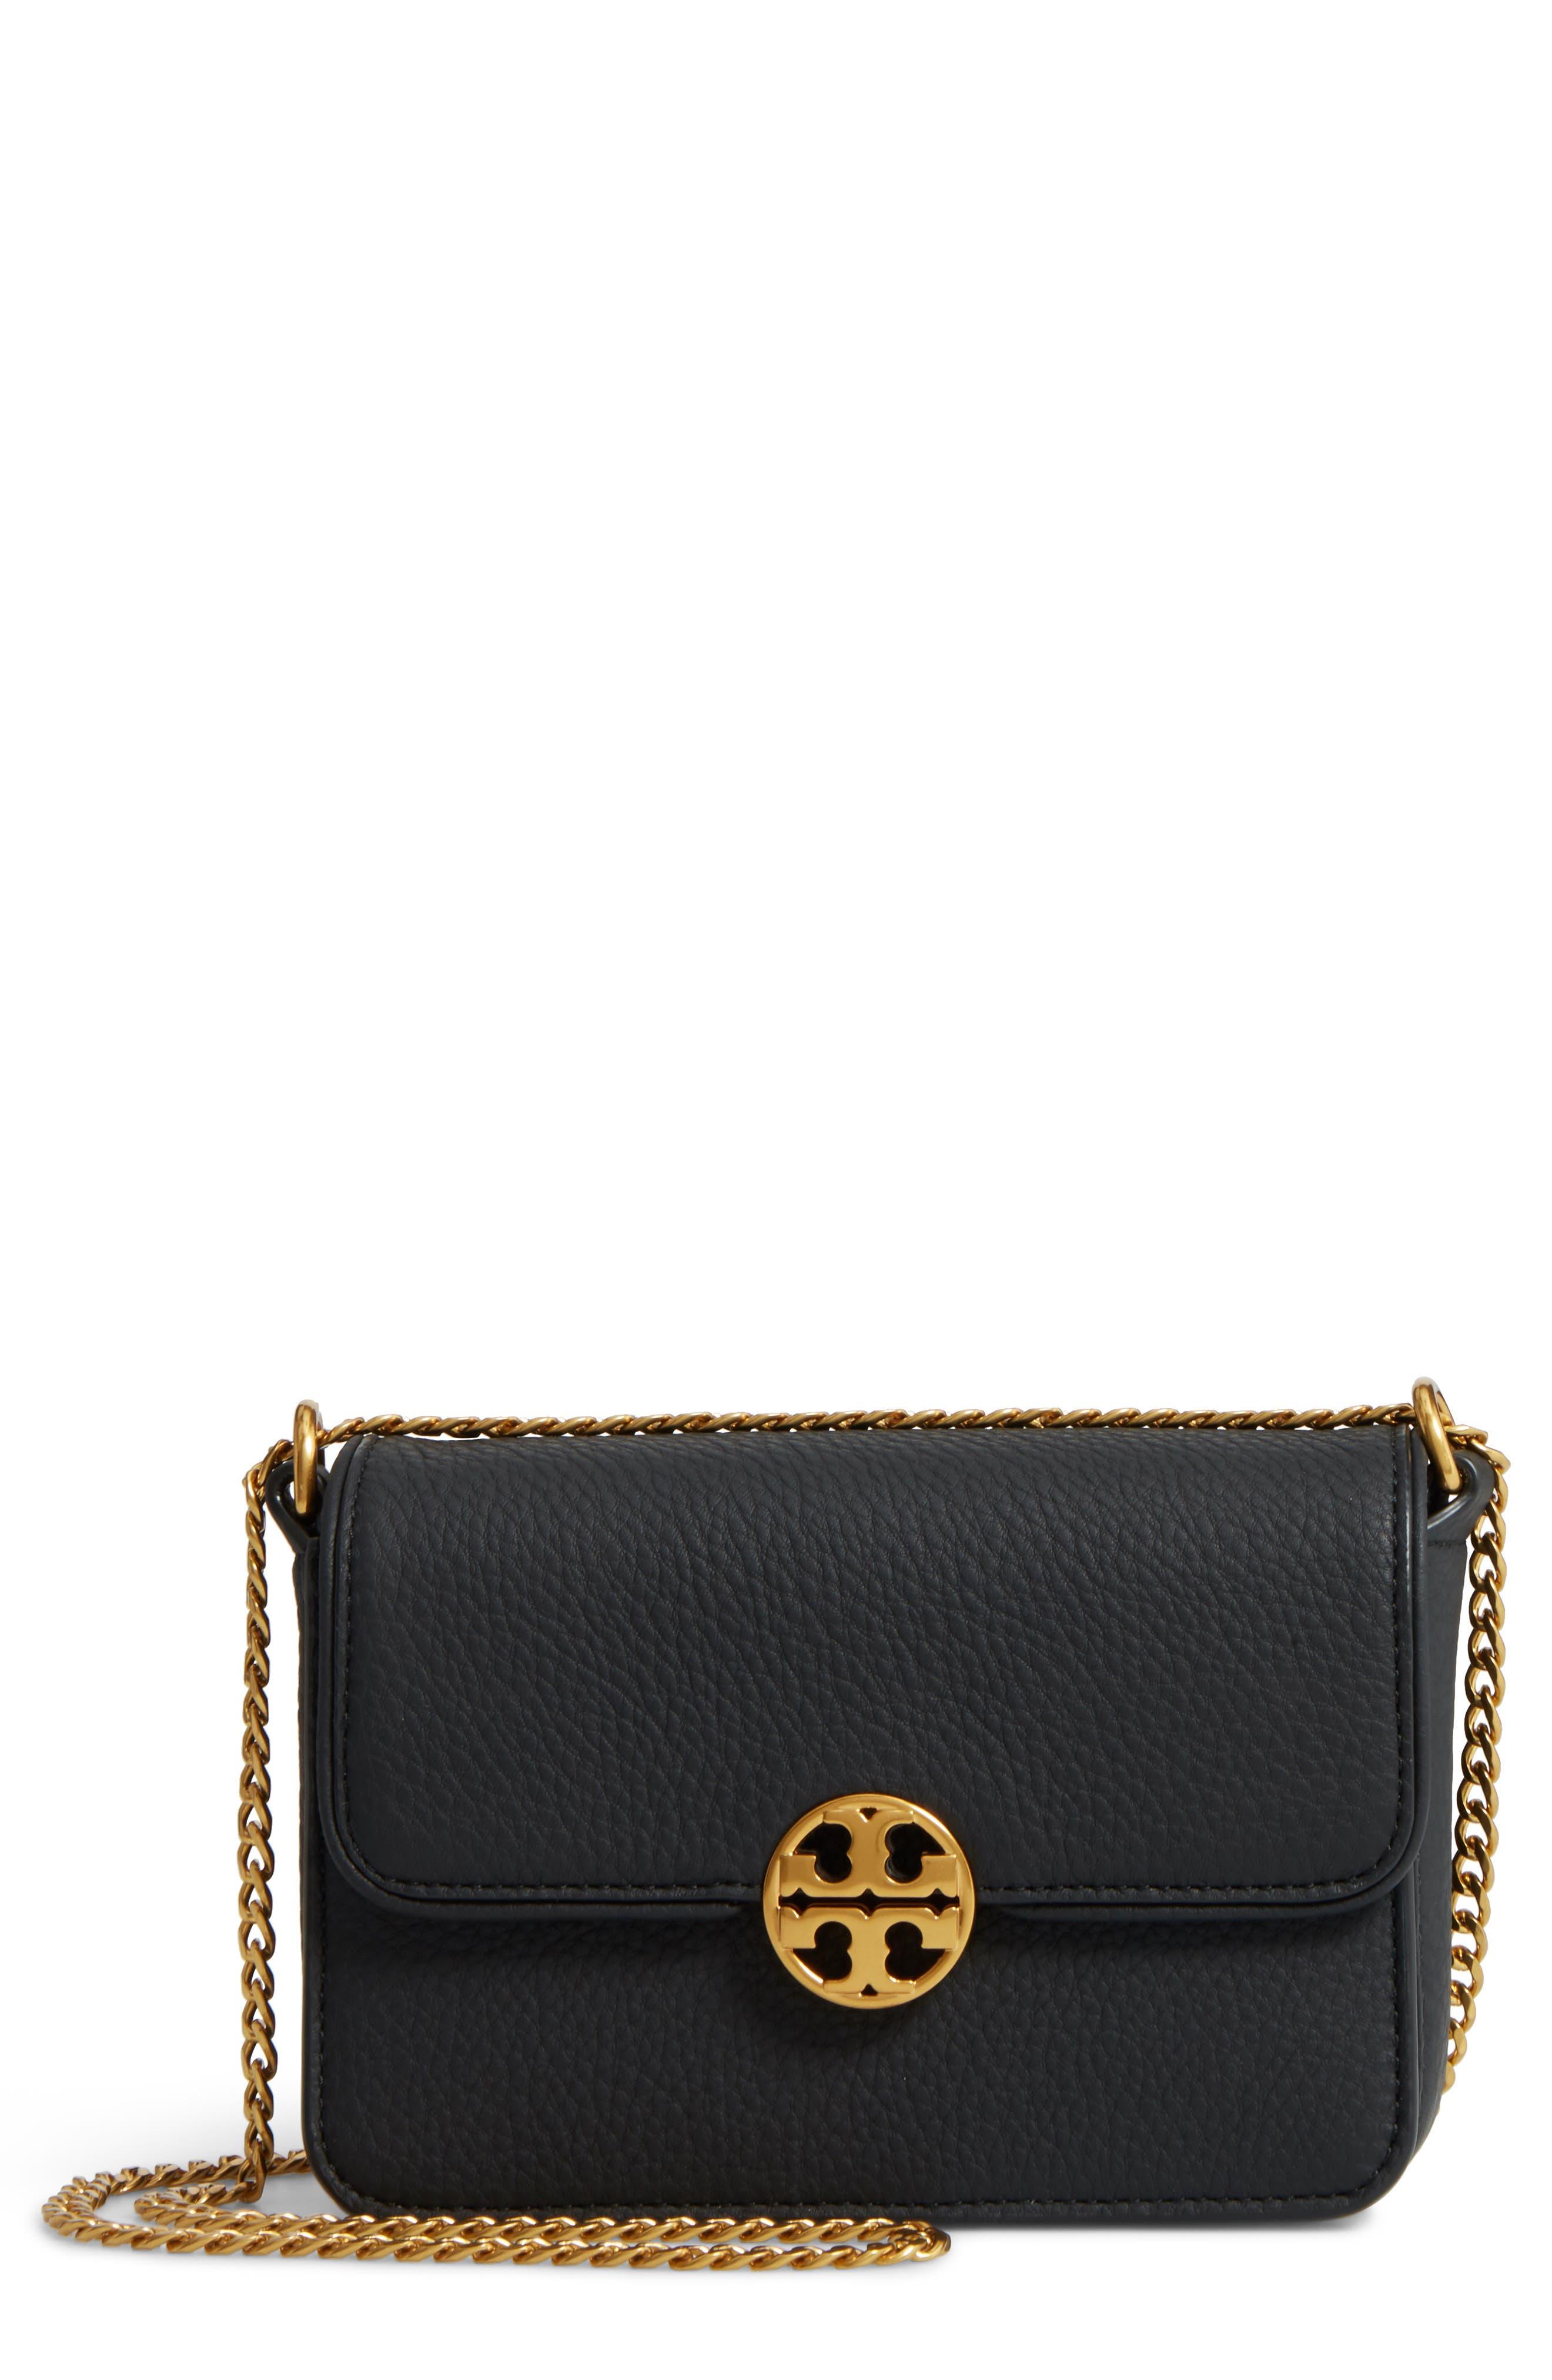 TORY BURCH Mini Chelsea Leather Convertible Crossbody Bag, Main, color, 001